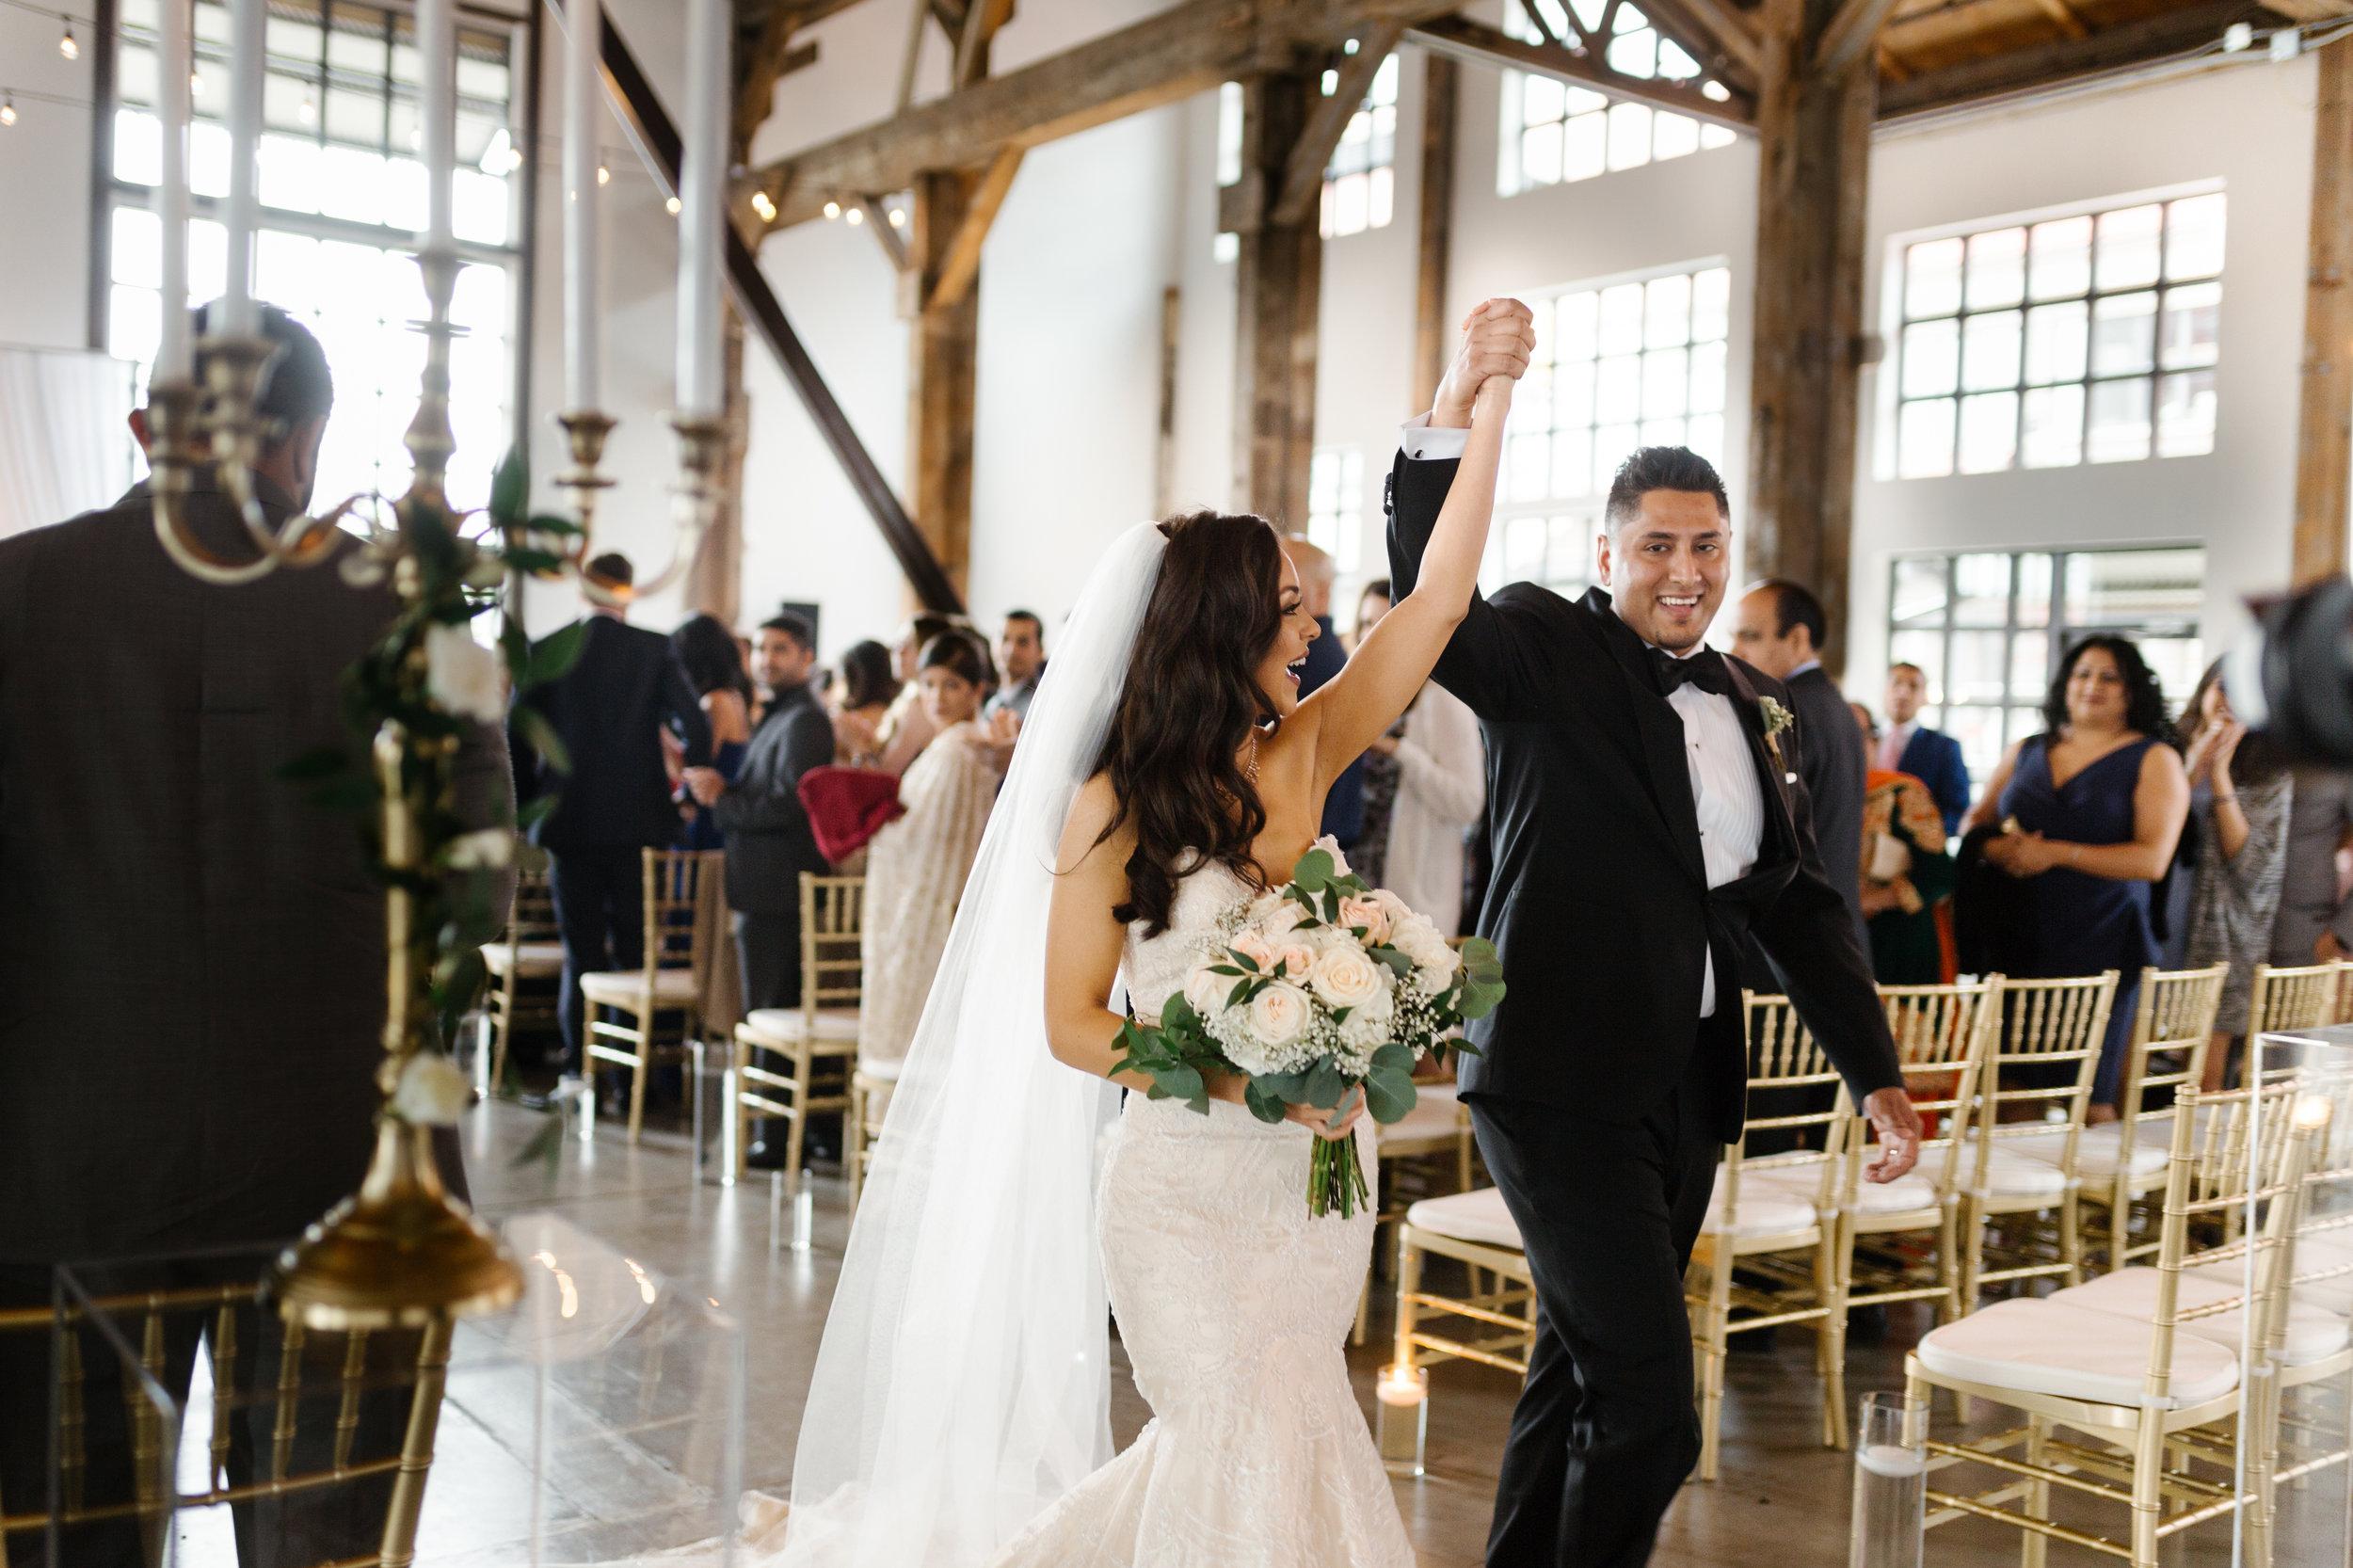 herafilms_wedding_trina_andy_hera_selects-58.jpg